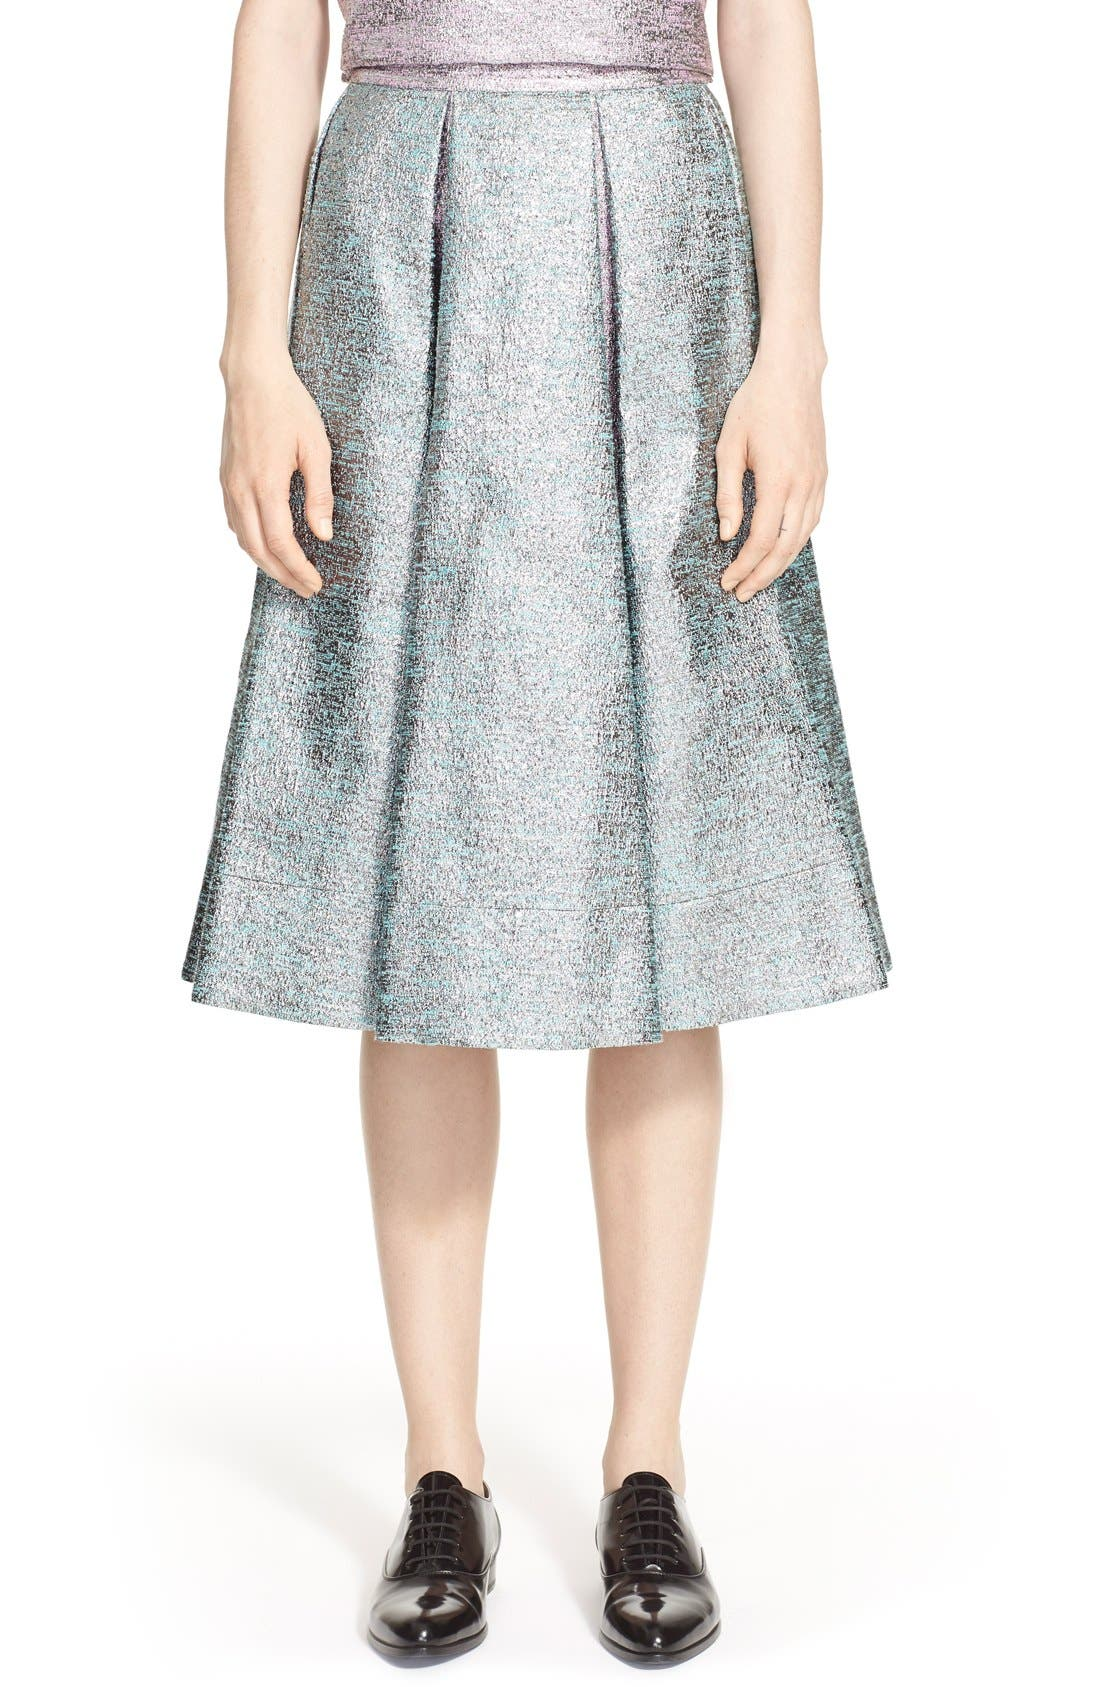 Alternate Image 1 Selected - PASKAL Metallic Inverted Pleat Flared Skirt